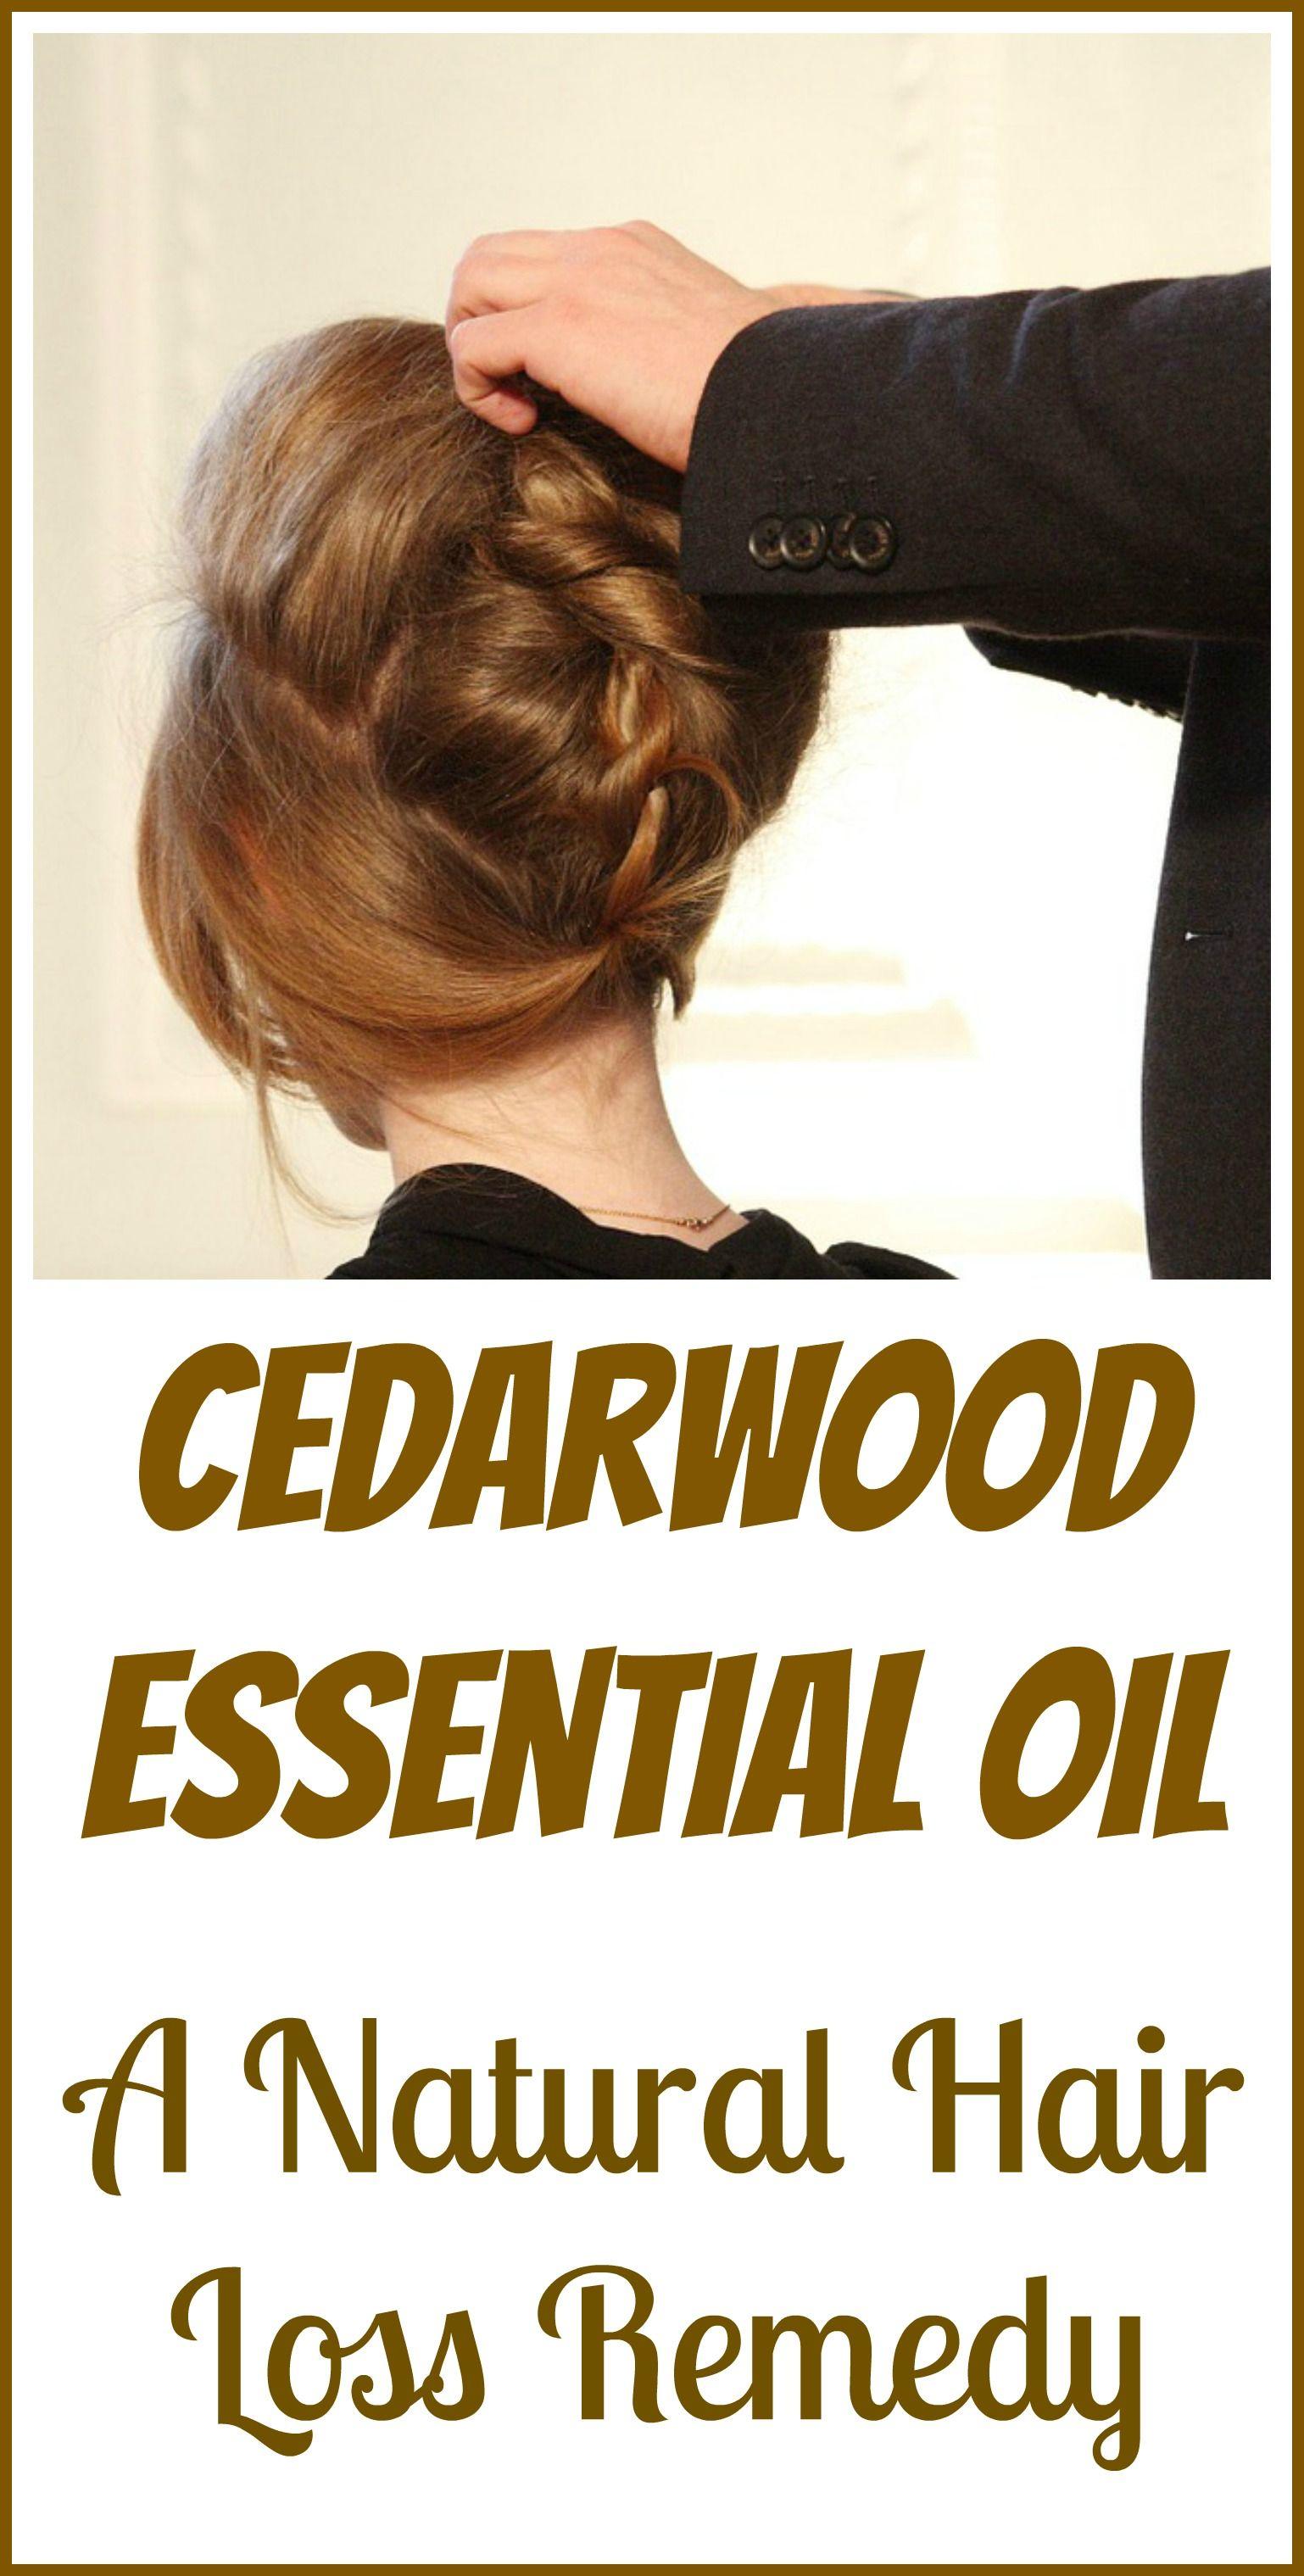 Cedarwood Oil For Hair Growth   Holistic Healing With Essential Oils